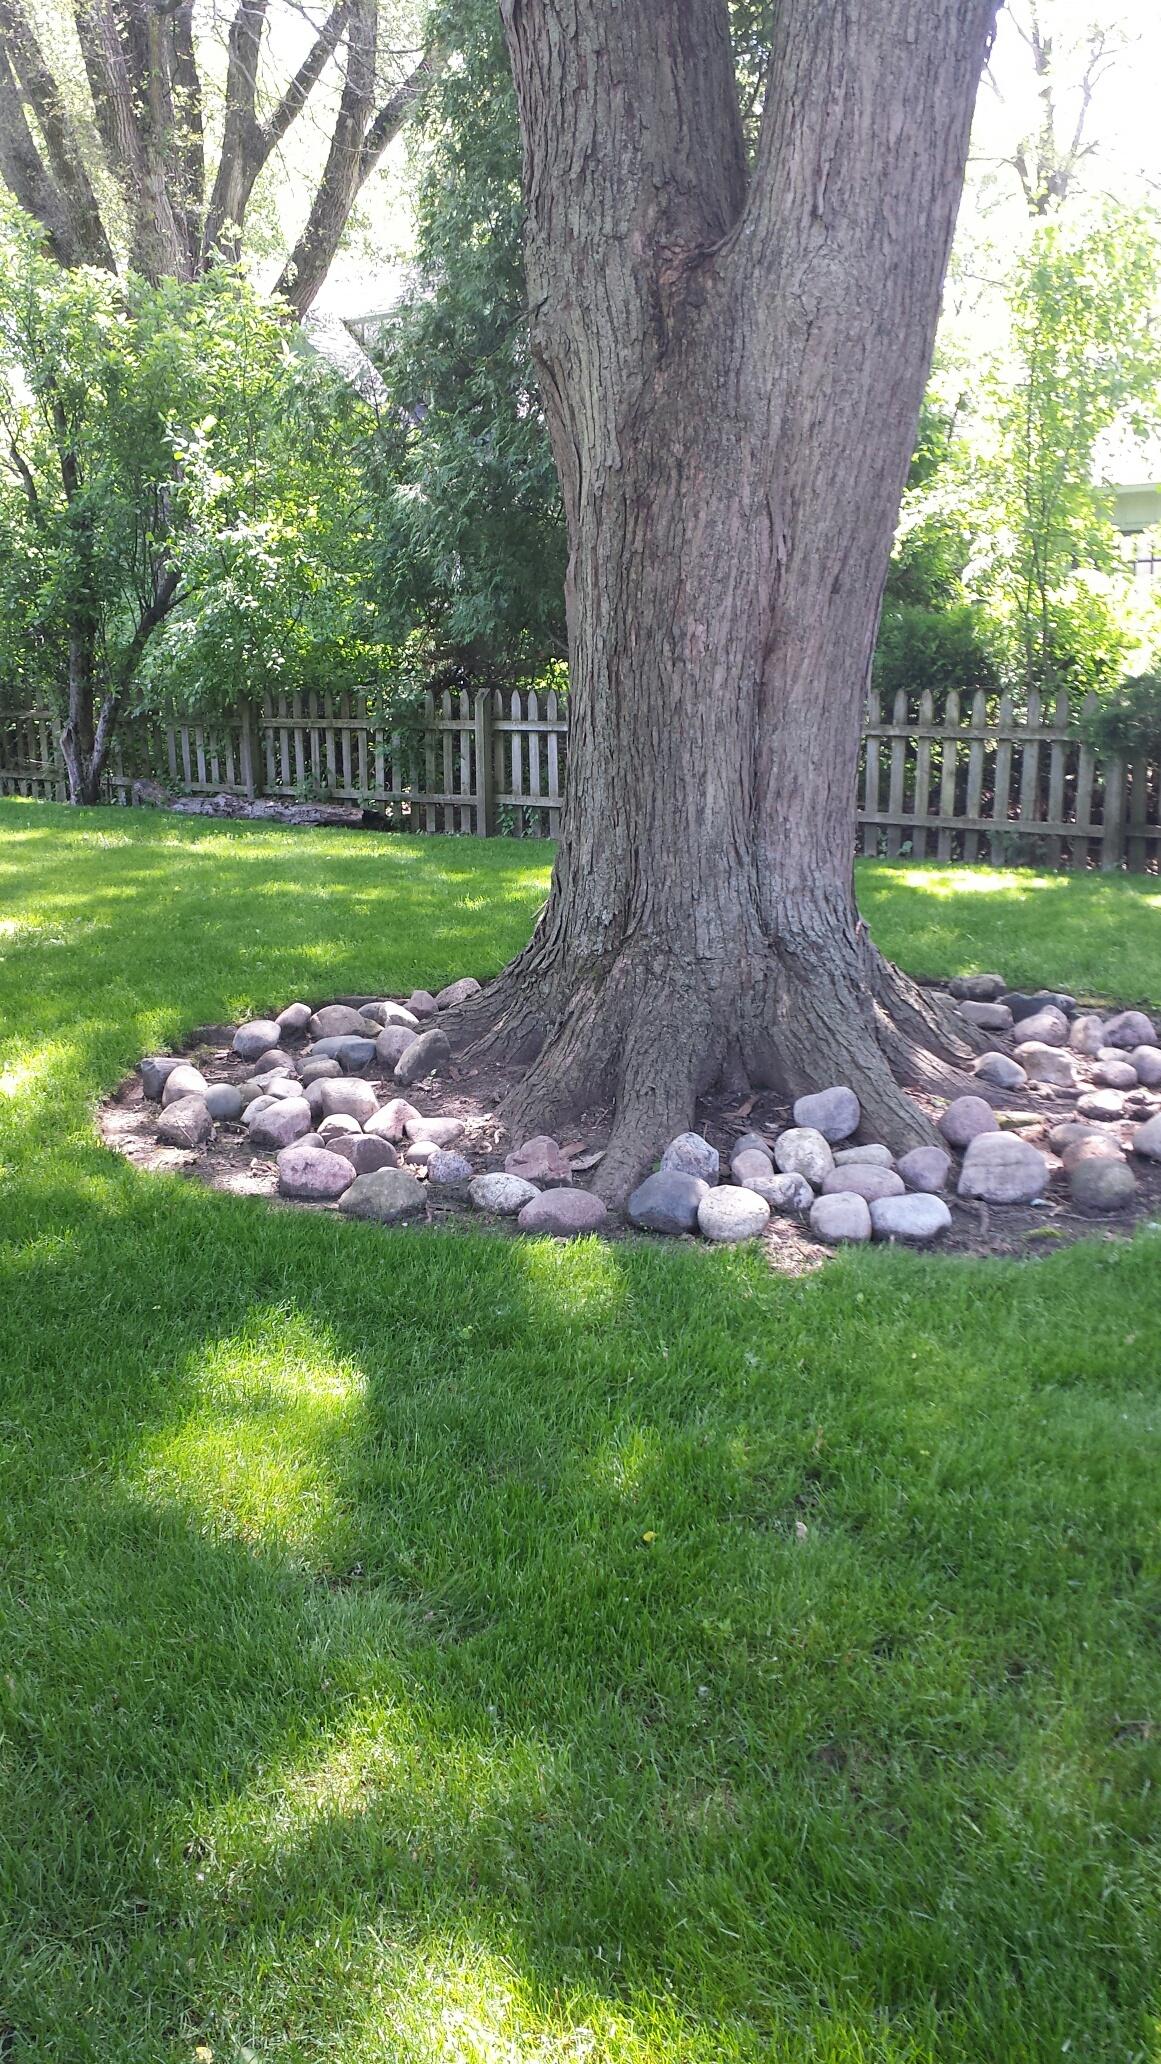 Joyce's Tree